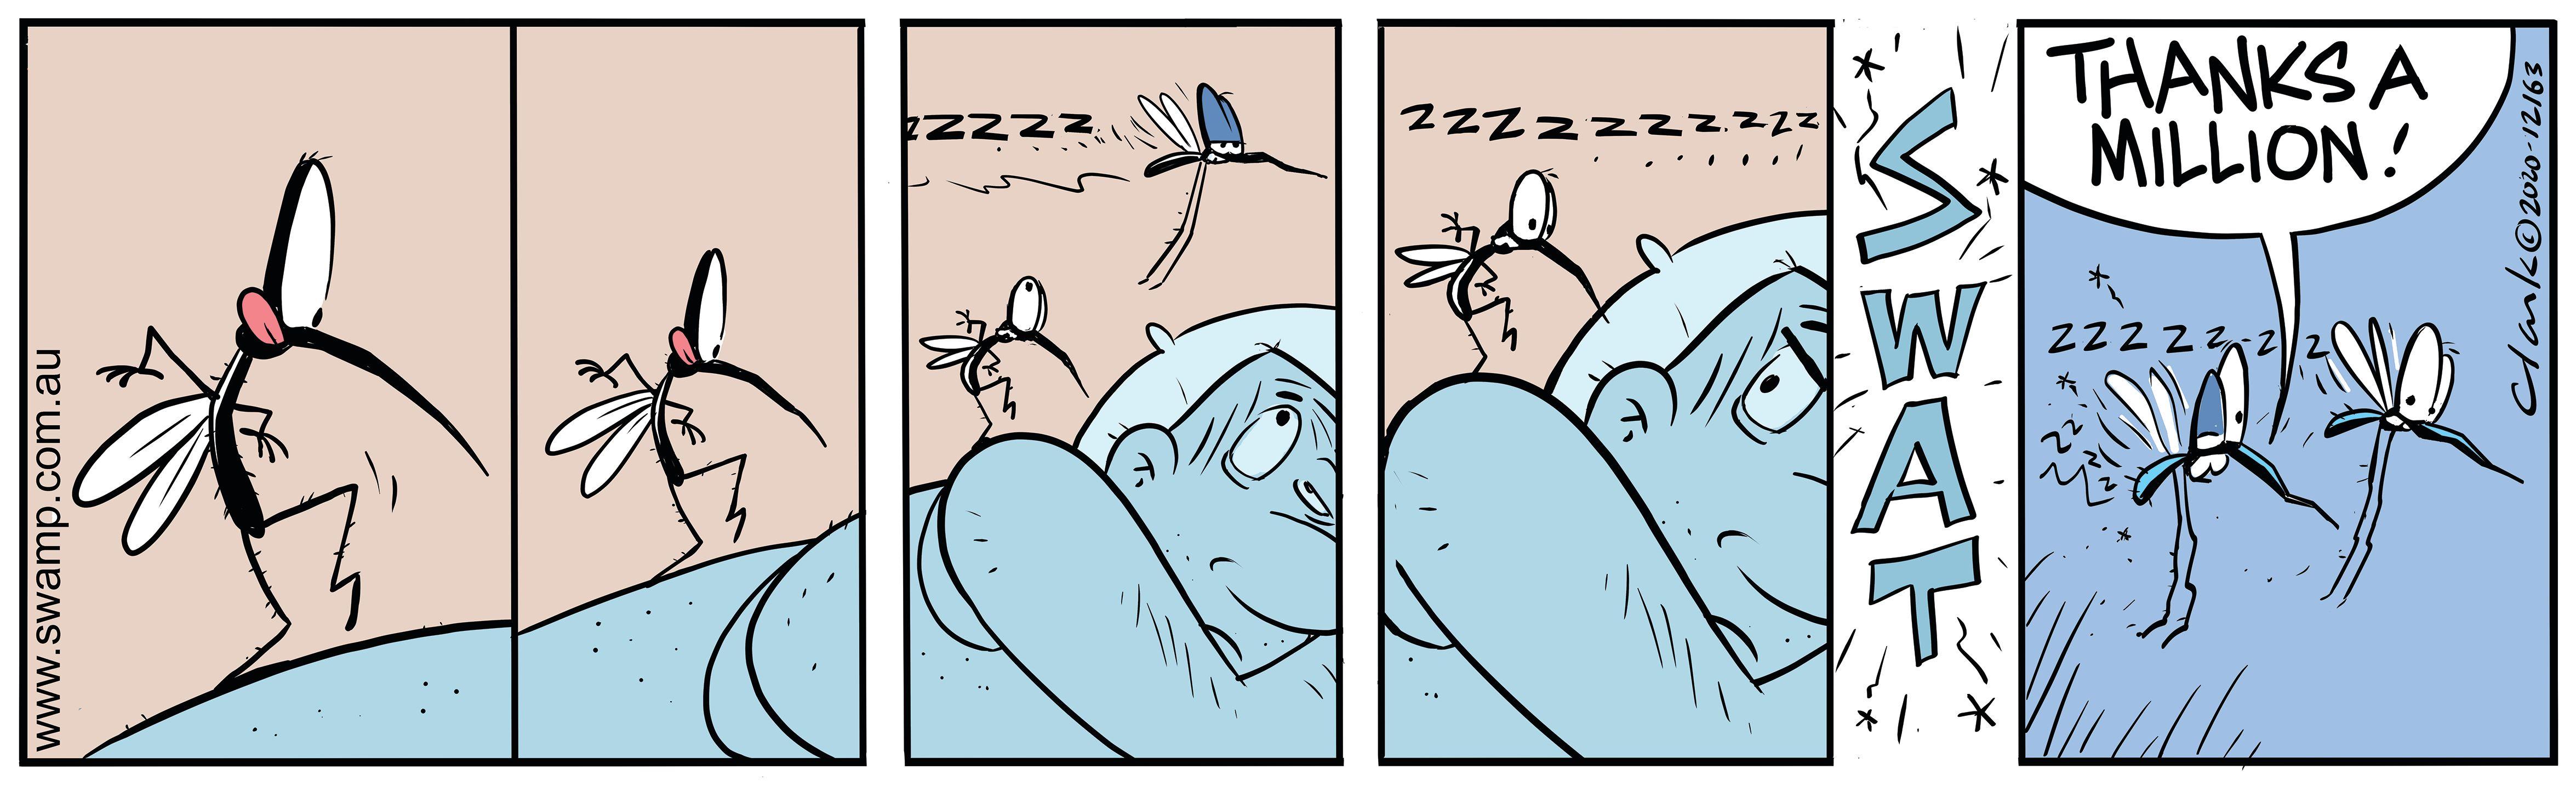 Mosquito Tip Toeing